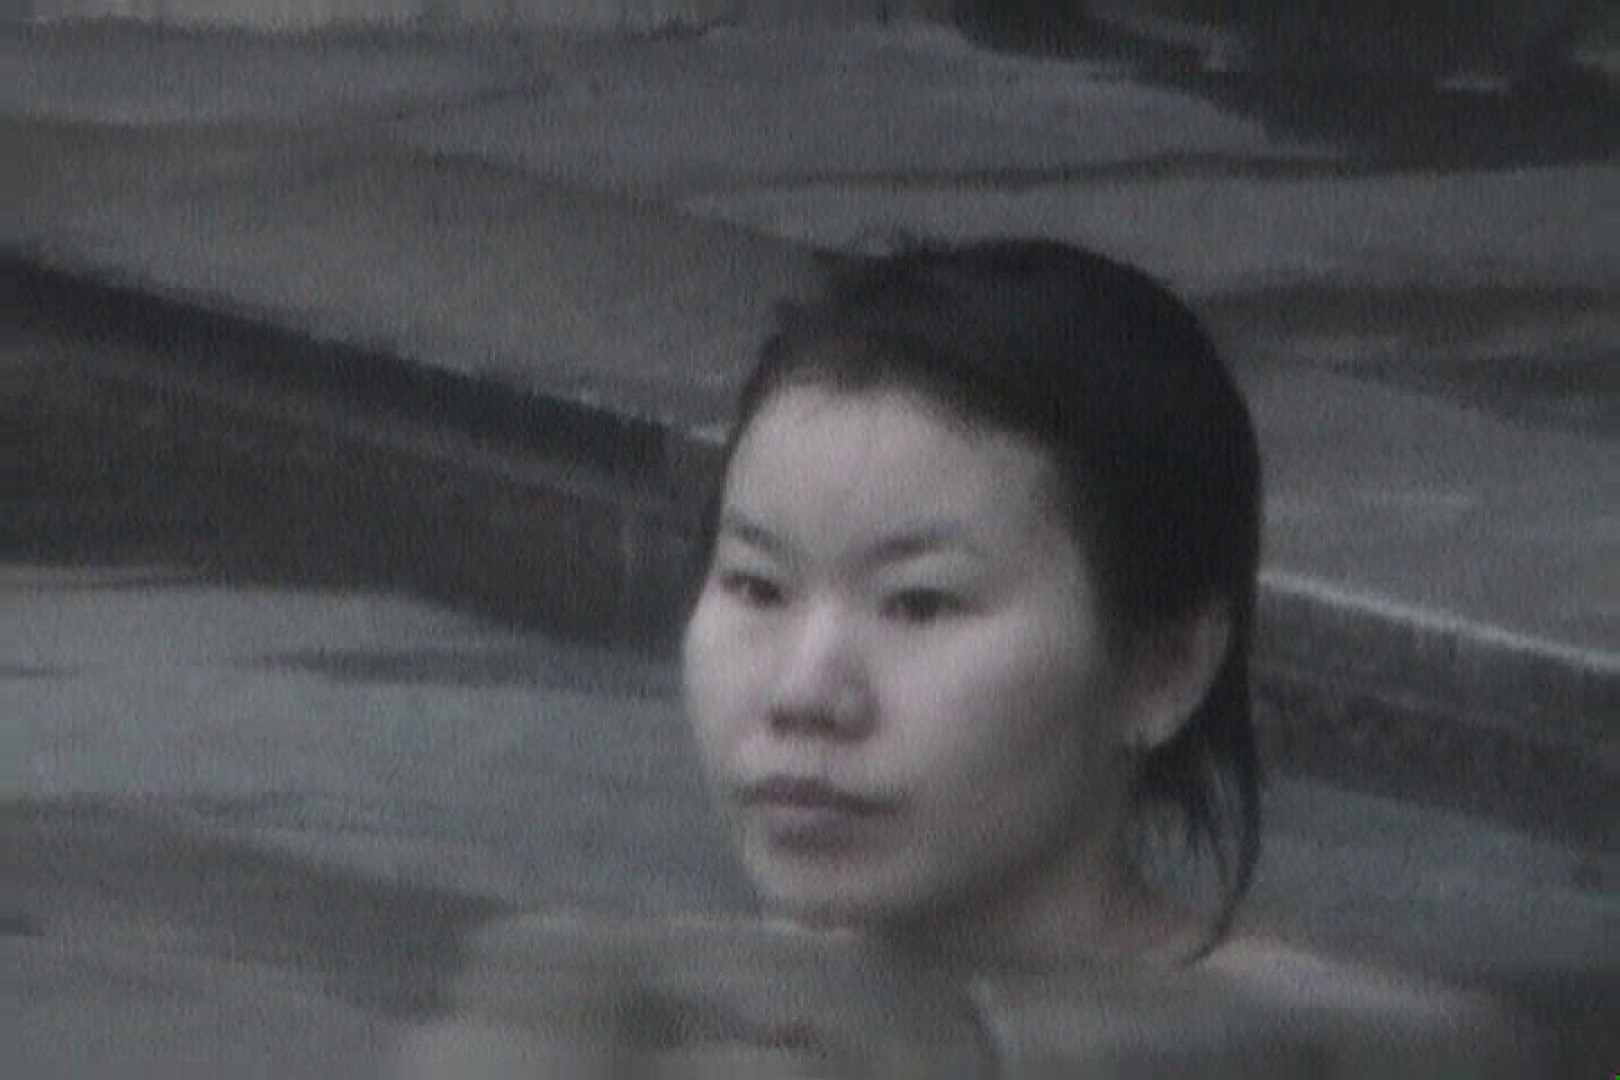 Aquaな露天風呂Vol.556 露天風呂編 | 盗撮シリーズ  99PIX 11